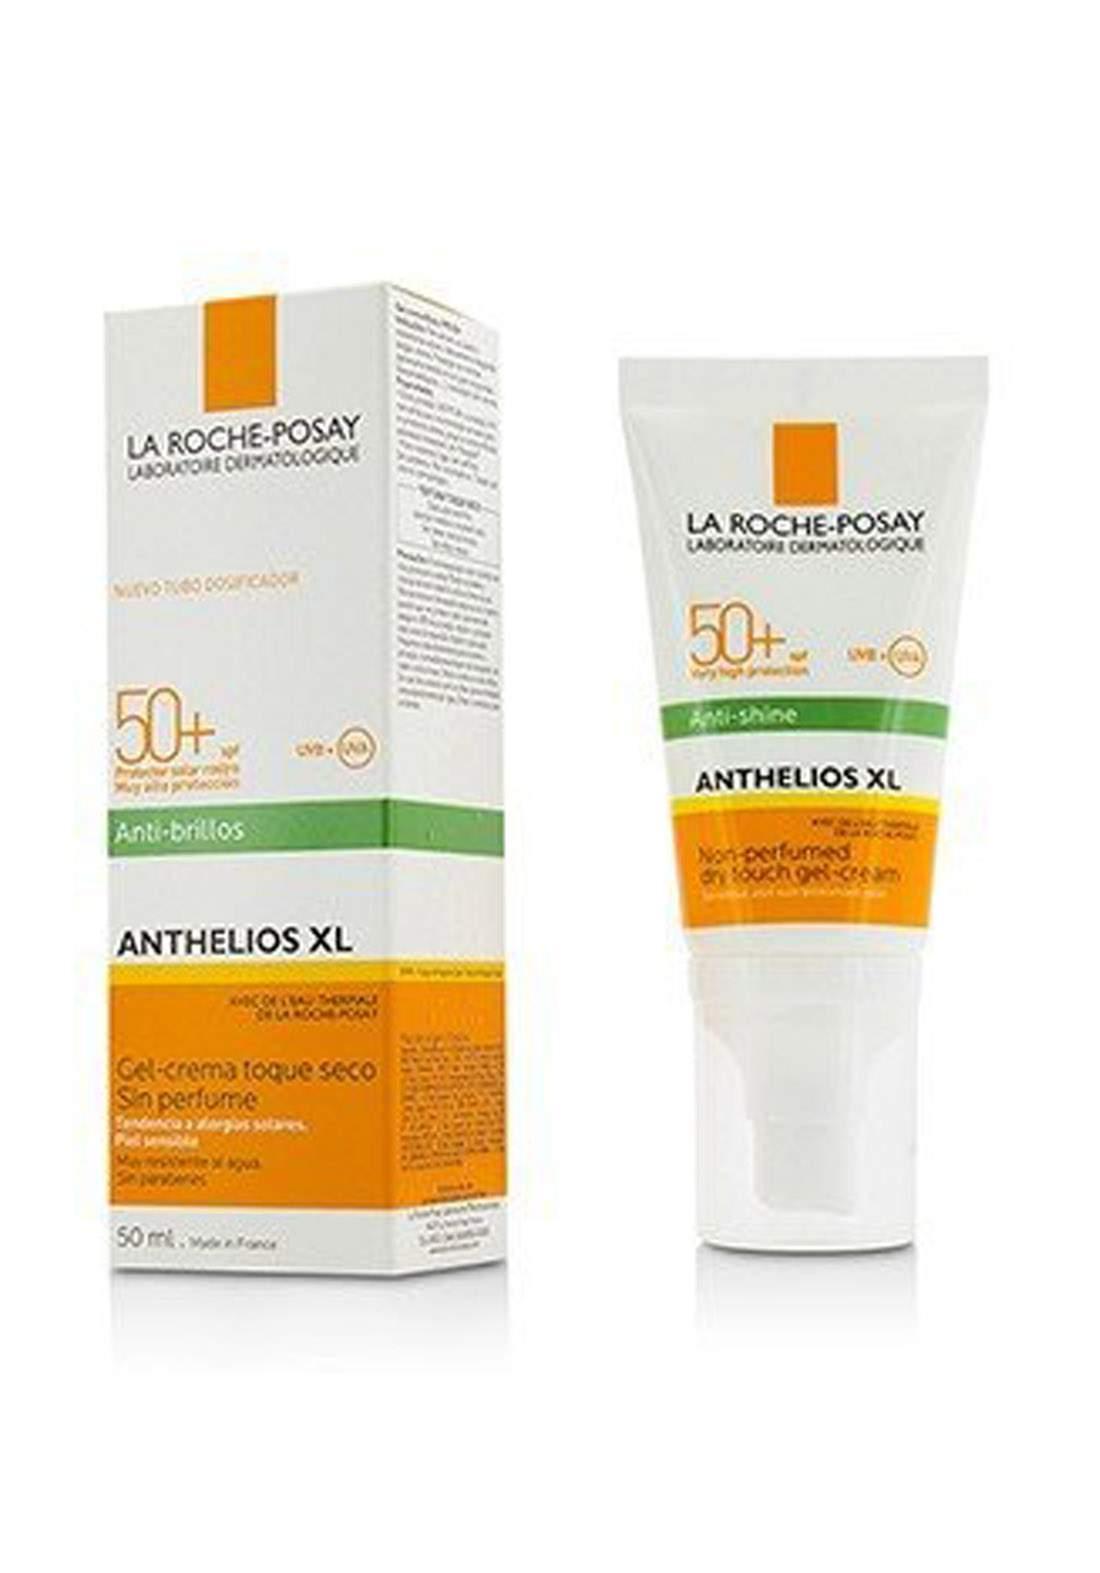 La Roche-Posay Anthelios Ultra Cream SPF50 + 50ml واقي لاروش